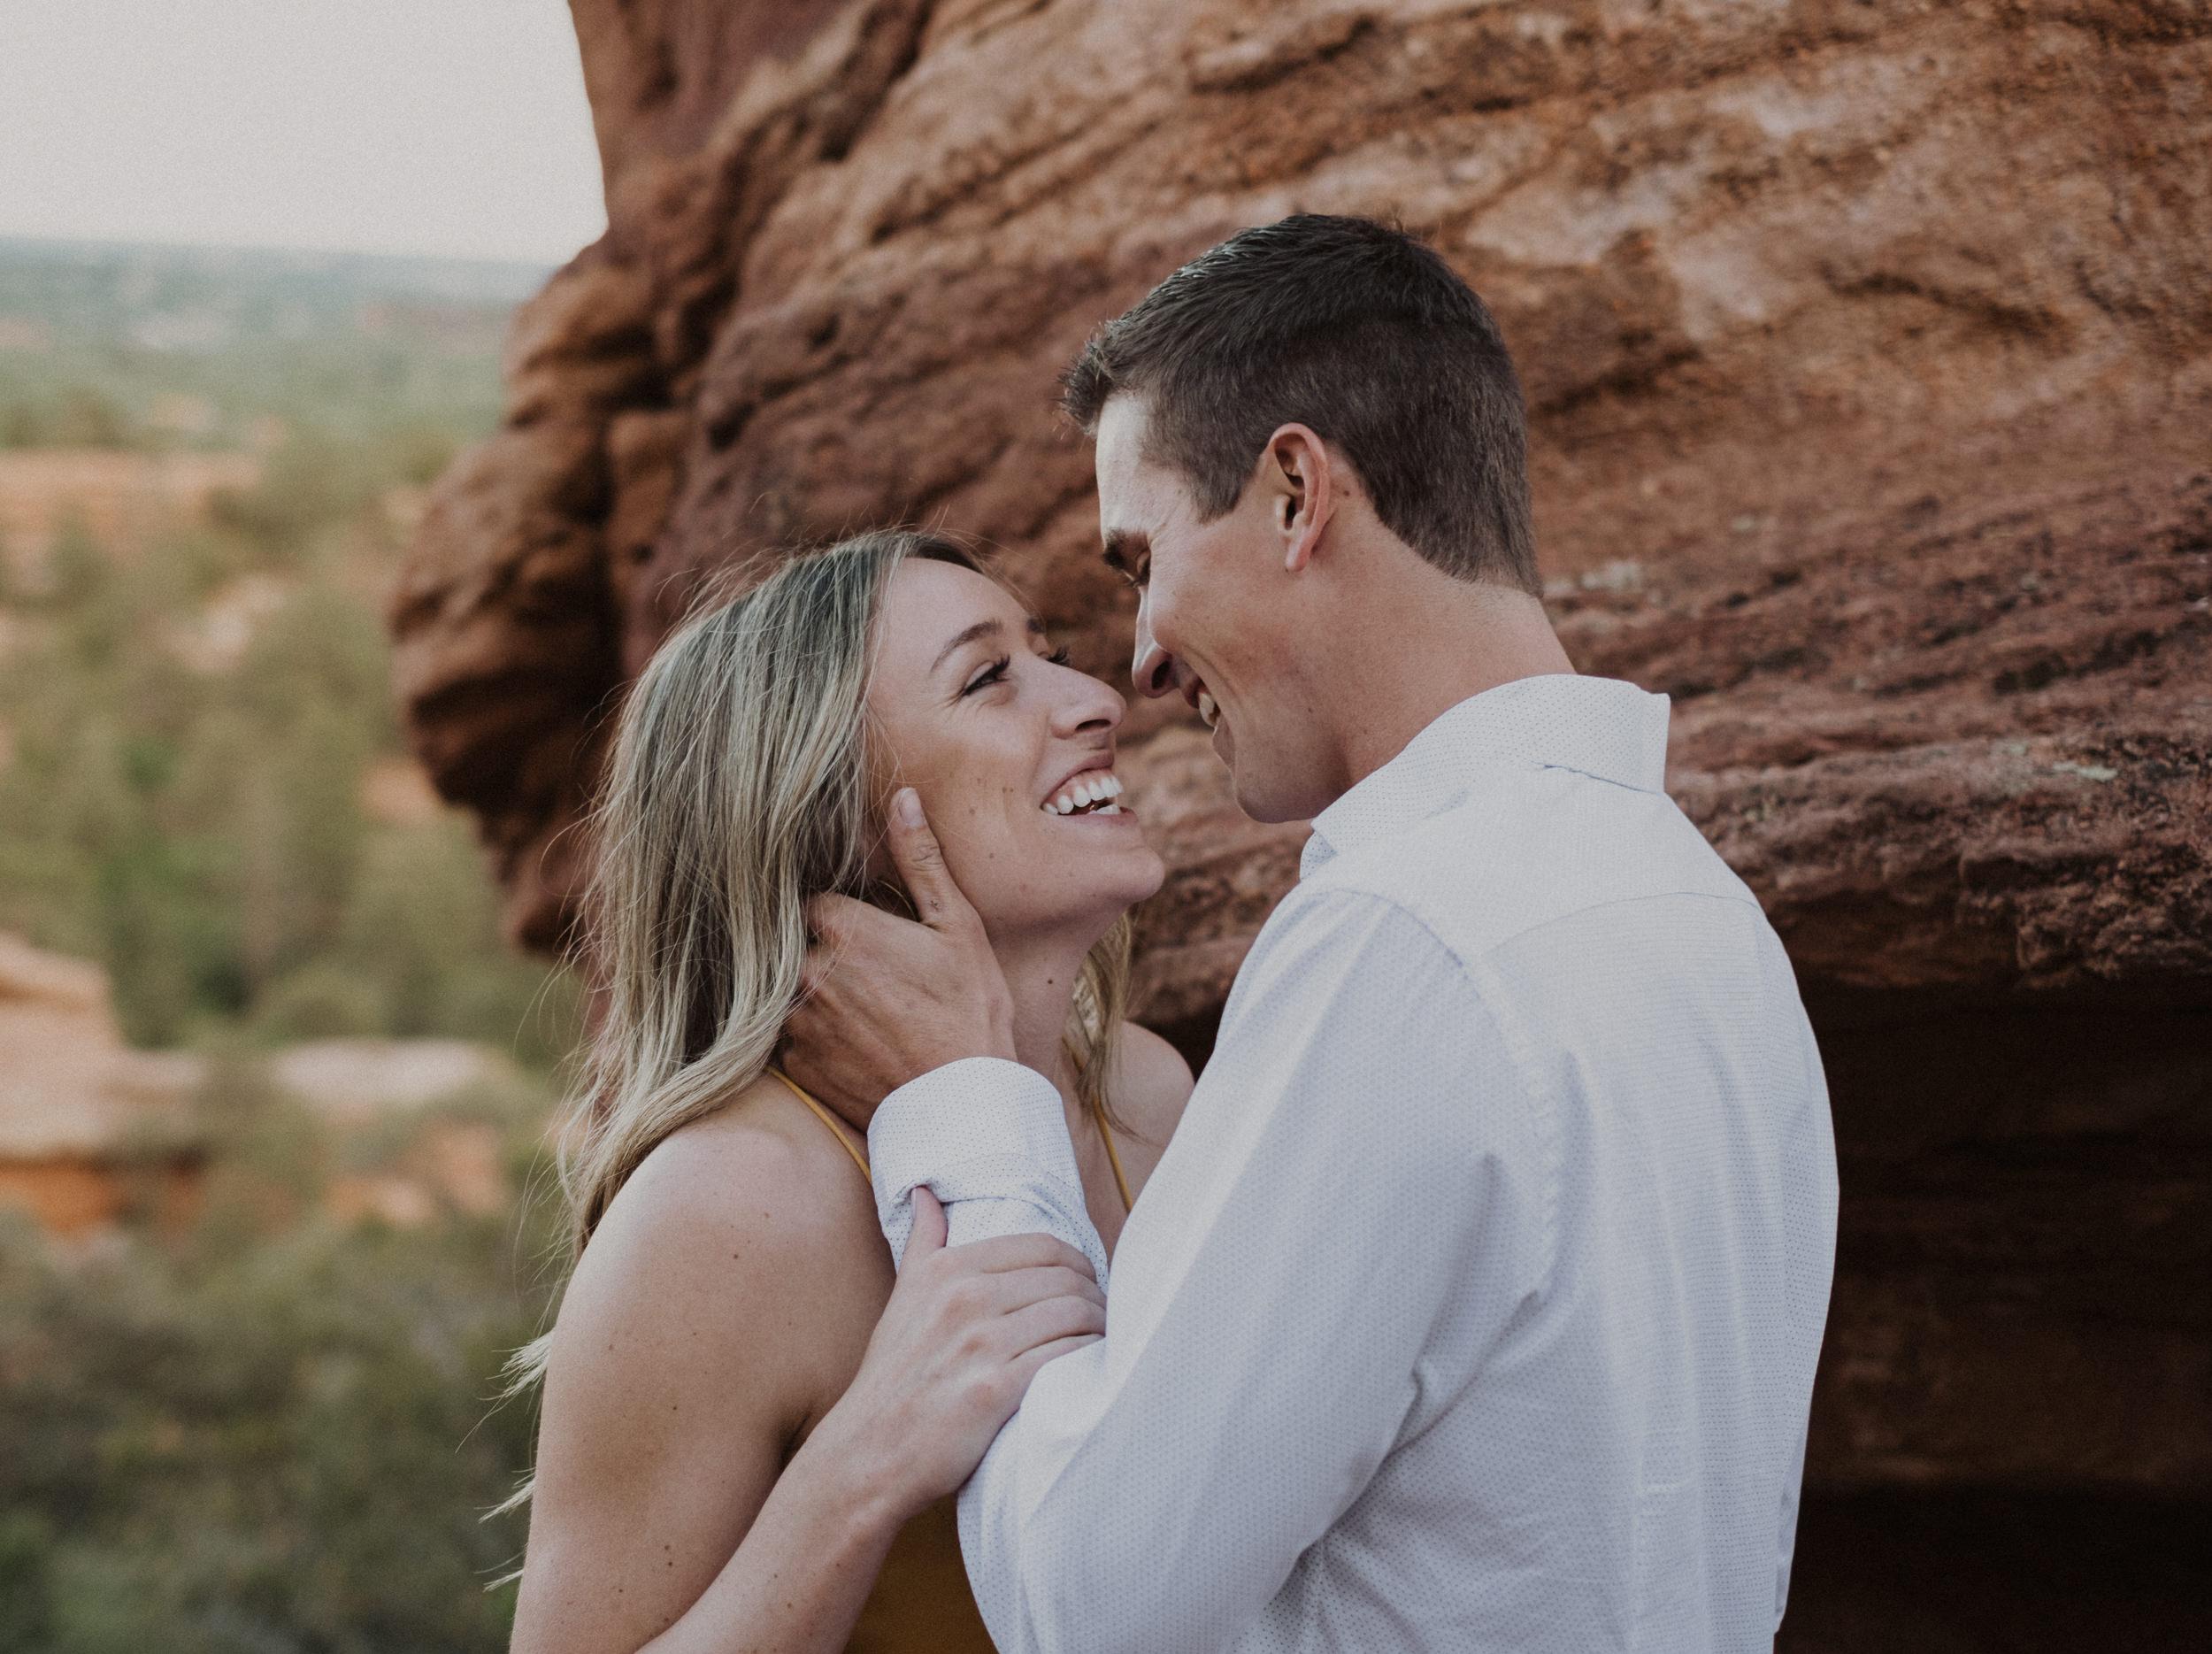 Elopement photo at Garden of the Gods. Colorado based elopement and wedding photographer. Garden of the Gods wedding. Colorado Springs elopement.